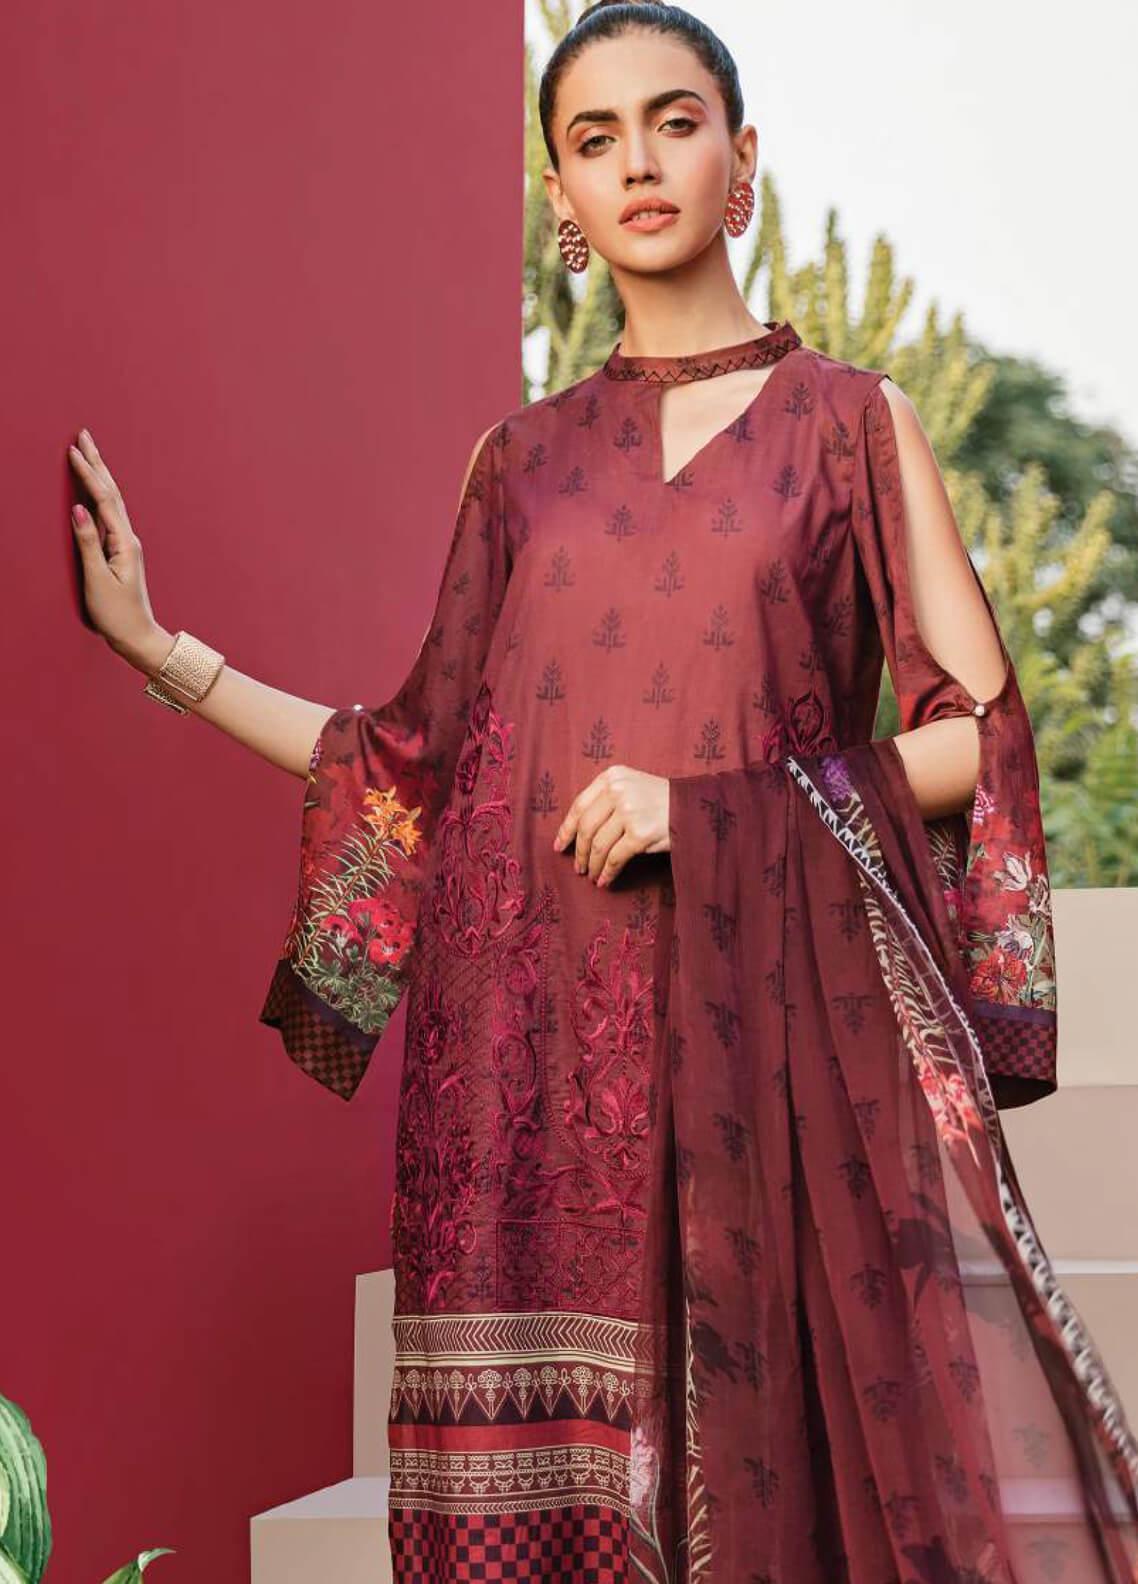 Serene Premium Embroidered Lawn Unstitched 3 Piece Suit SPM19L 12 REGAL MAGNA - Spring / Summer Collection